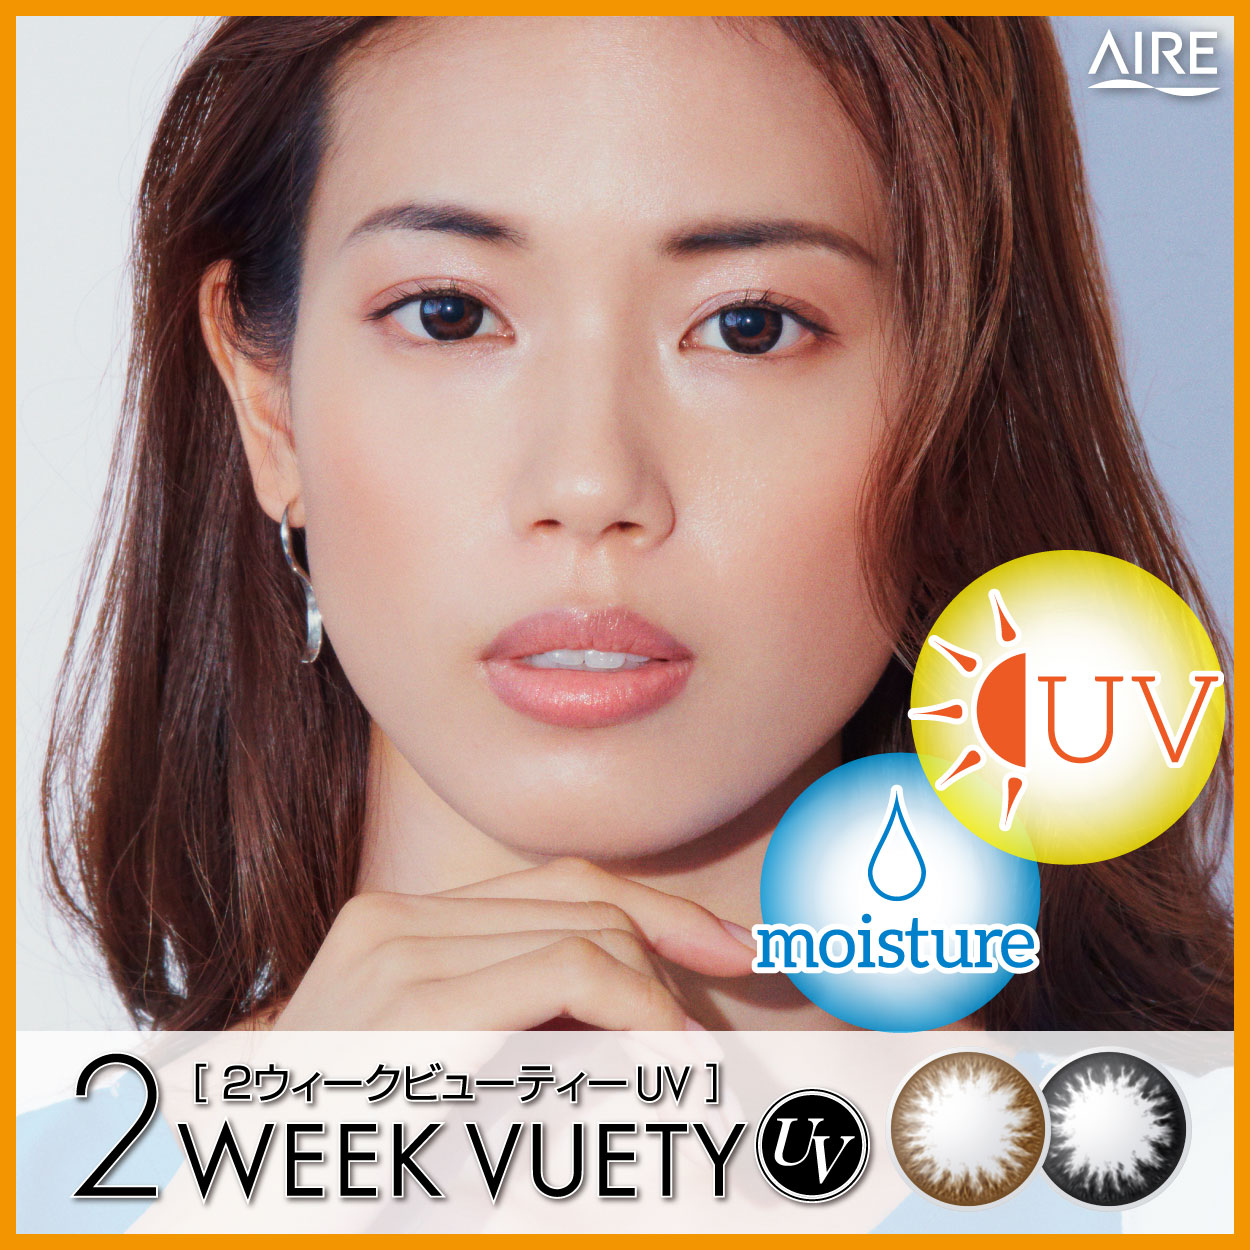 2week VUETY UV